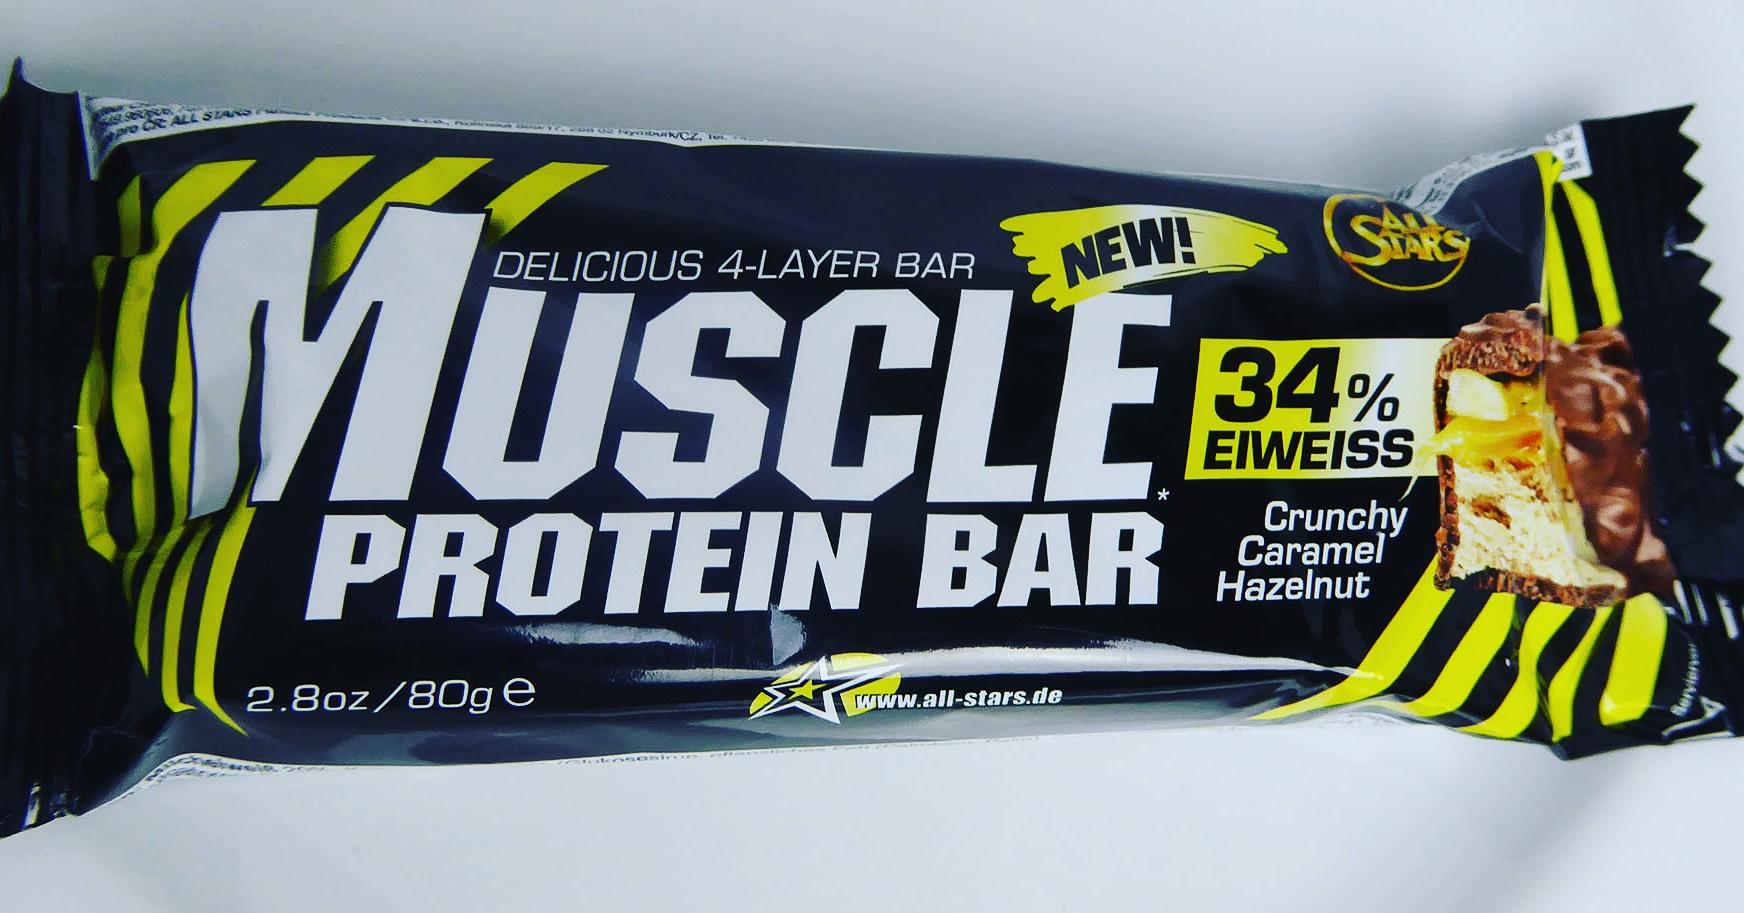 Muscle Protein Bar Crunchy Caramel Hazelnut